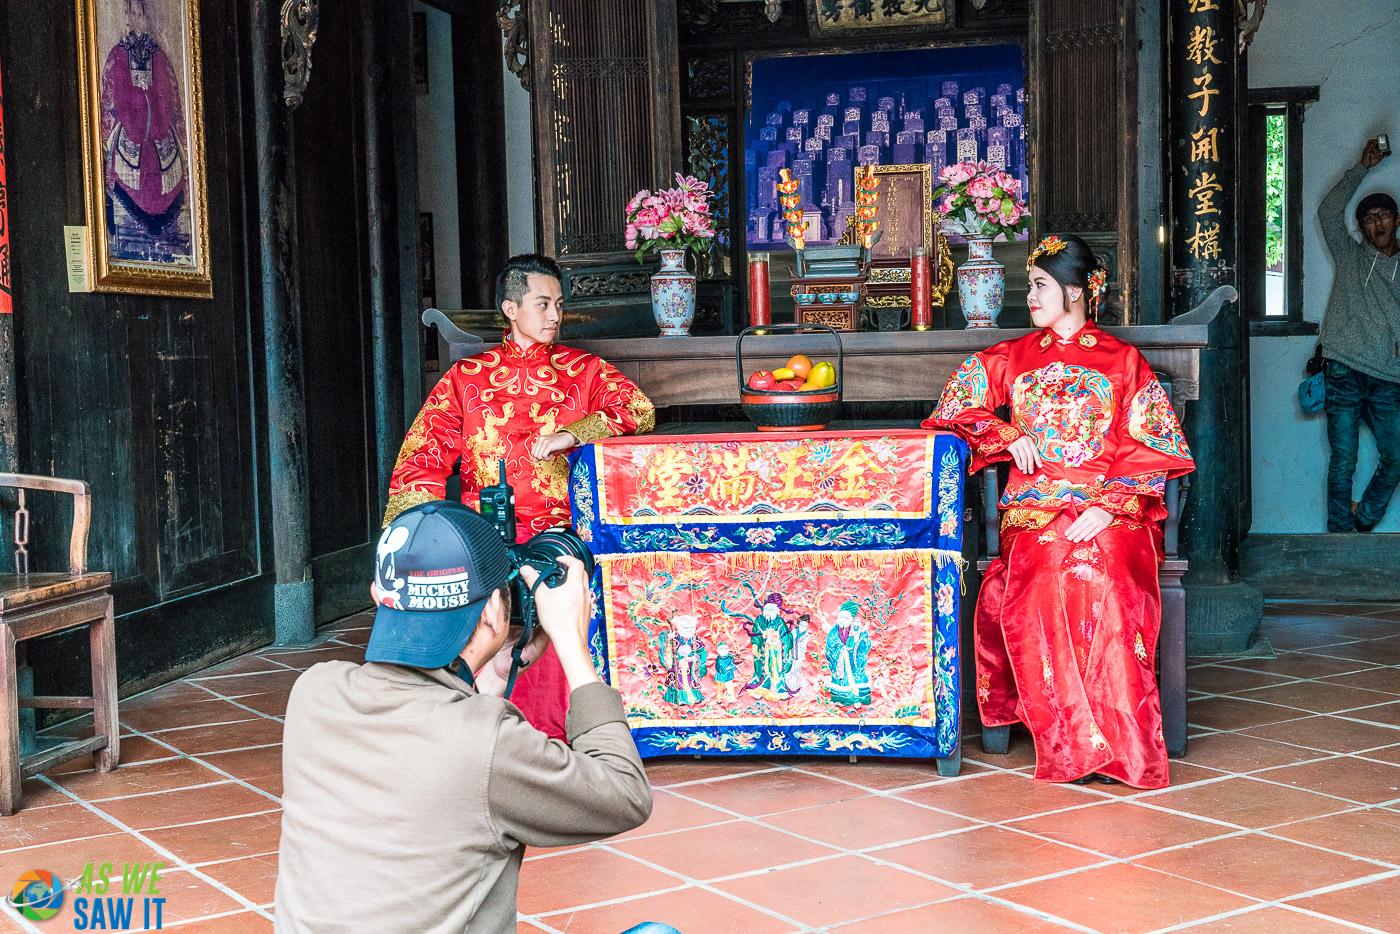 Behind the scenes of wedding photos